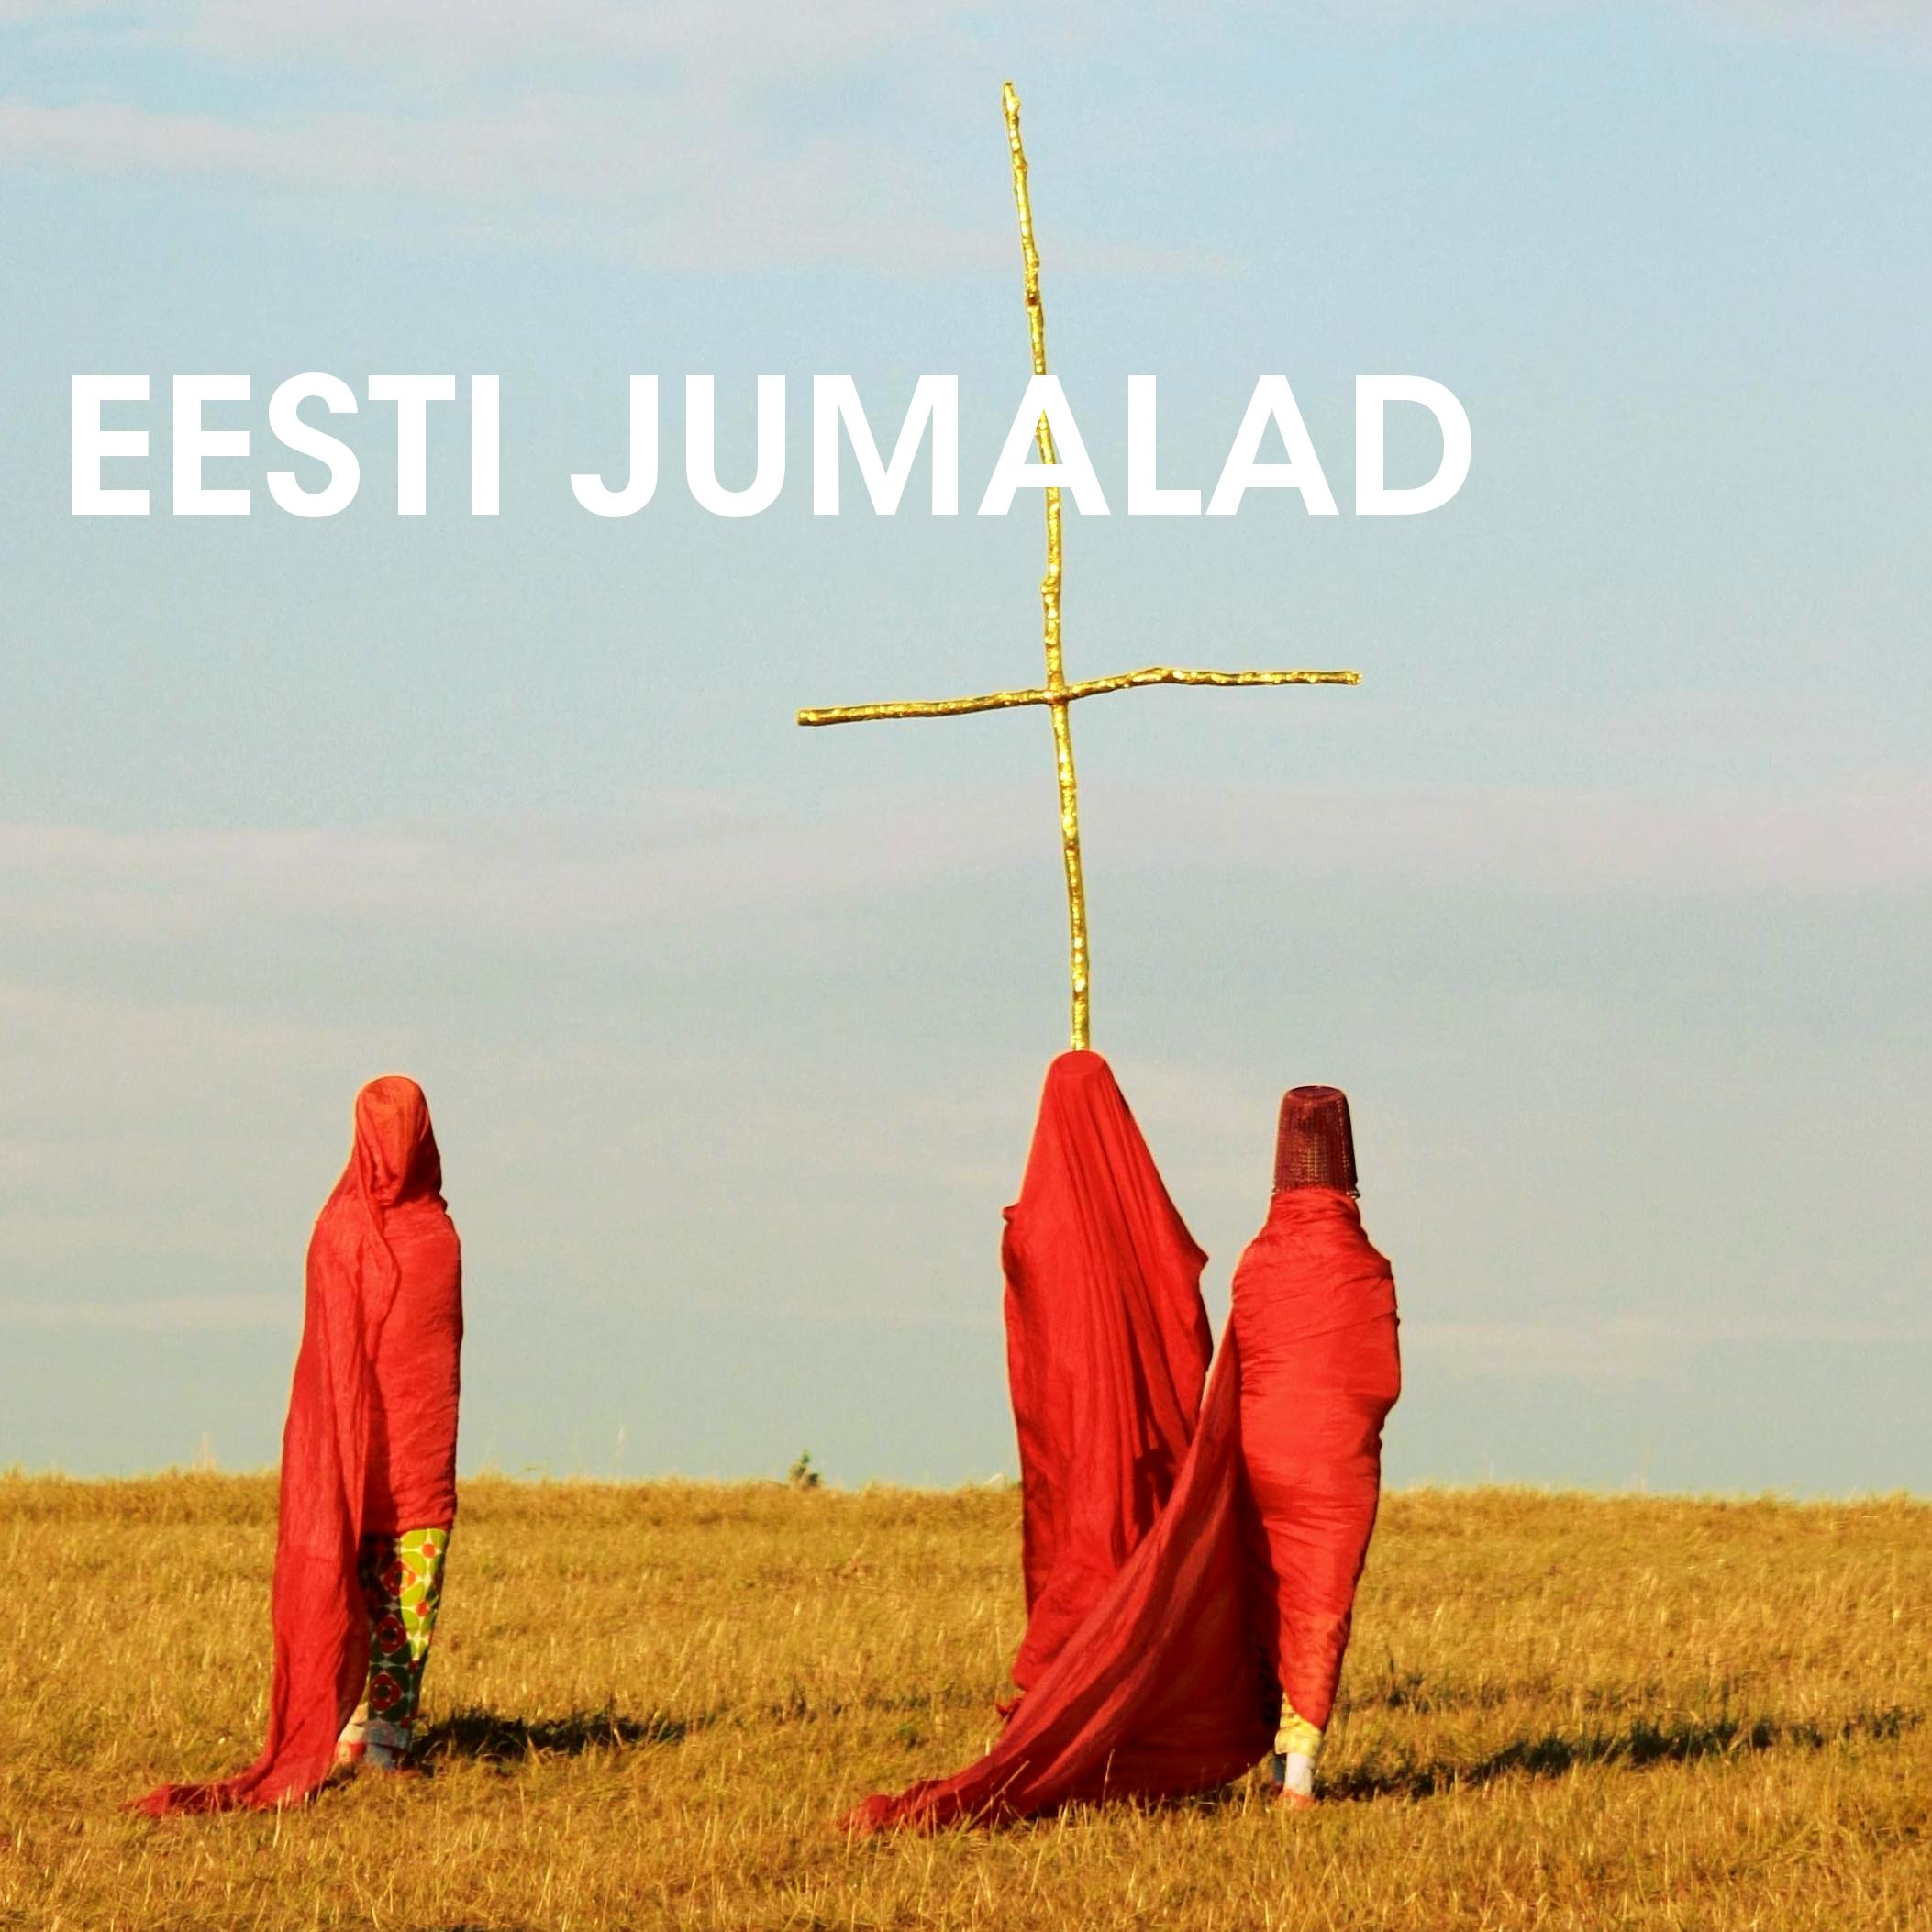 eesti jumalad.png